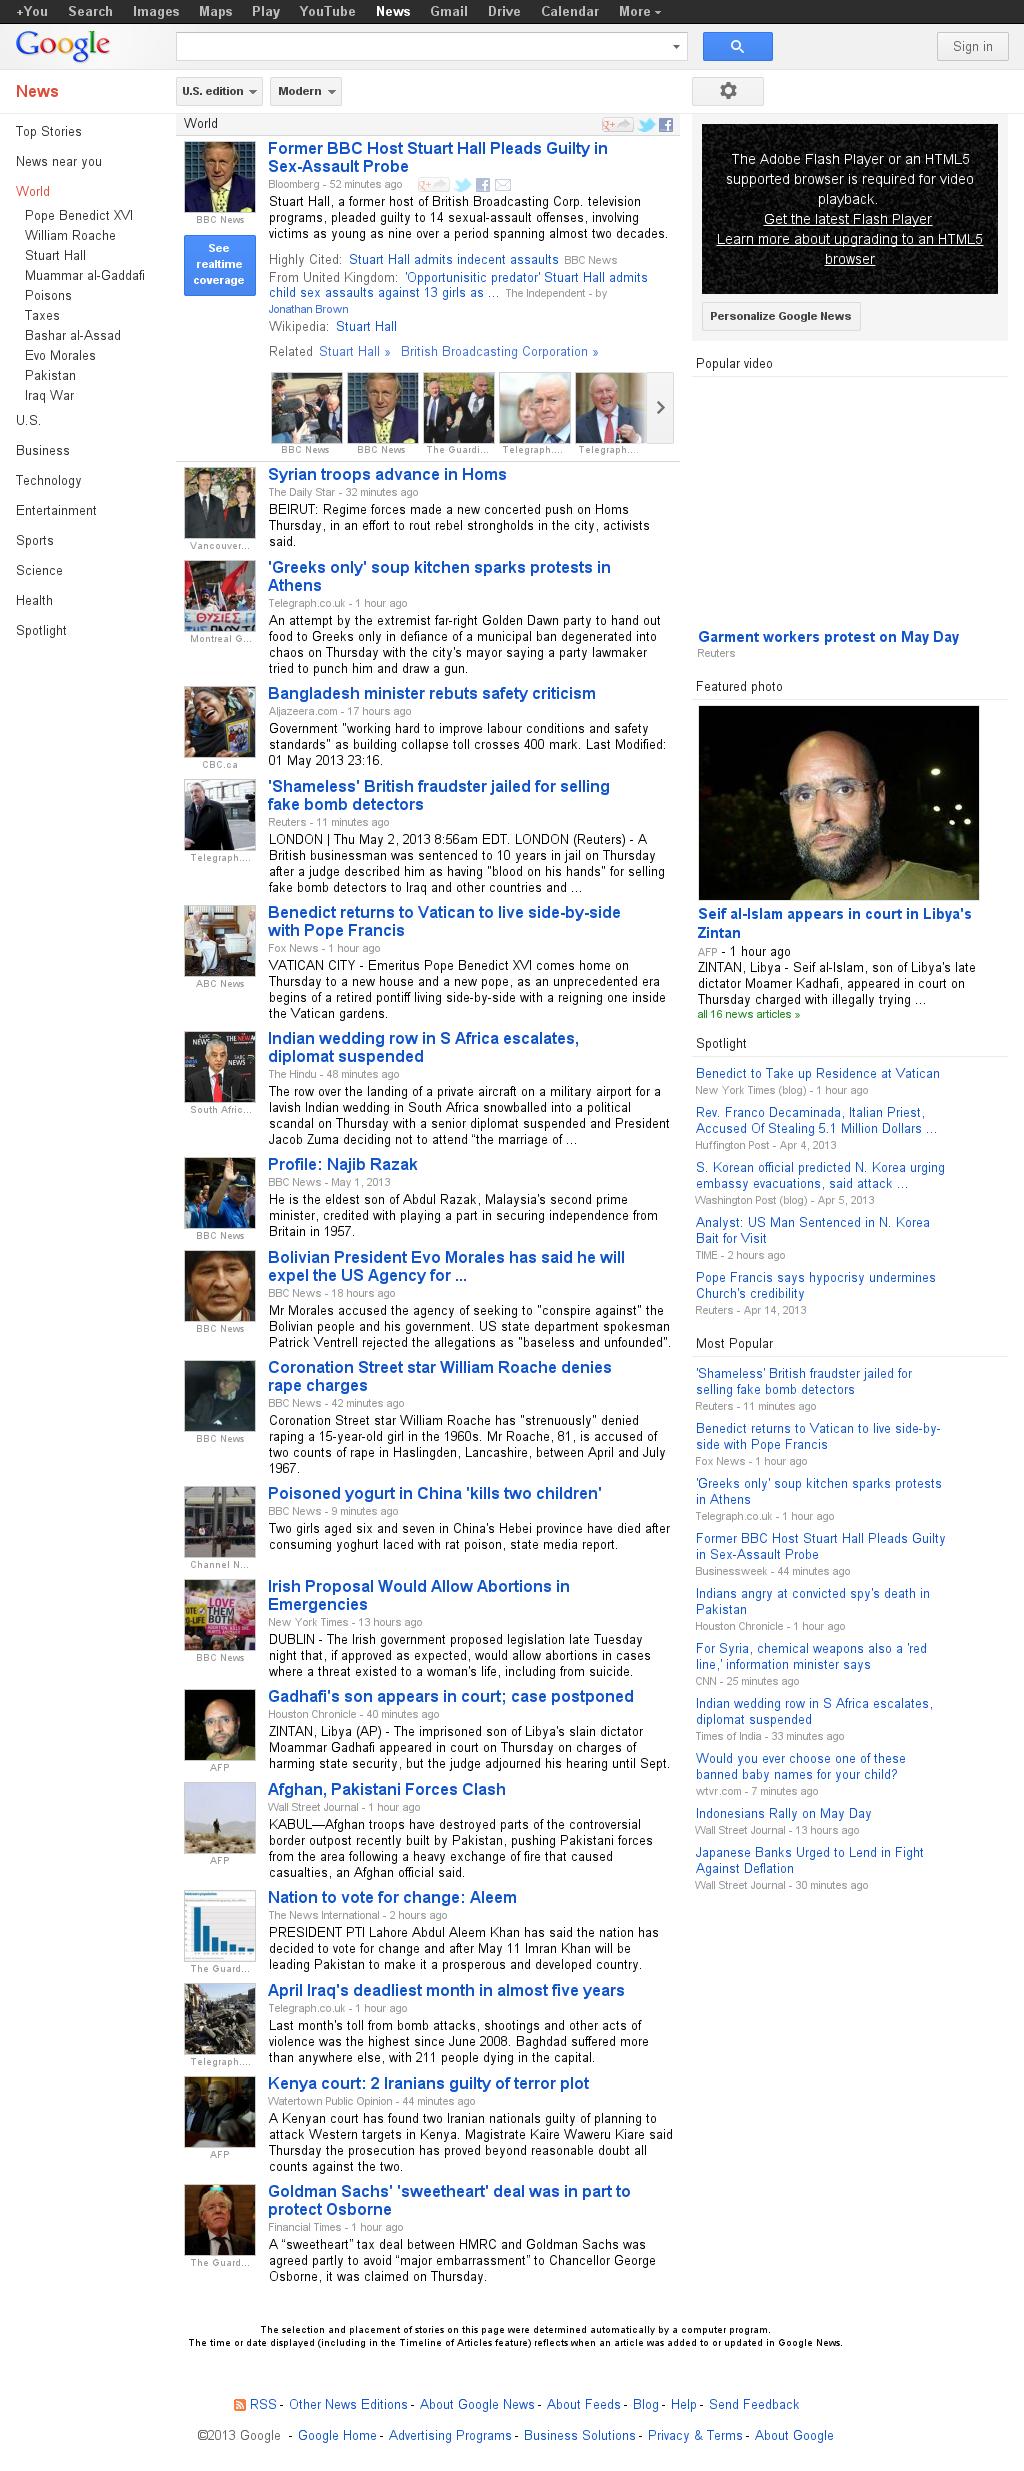 Google News: World at Thursday May 2, 2013, 1:10 p.m. UTC